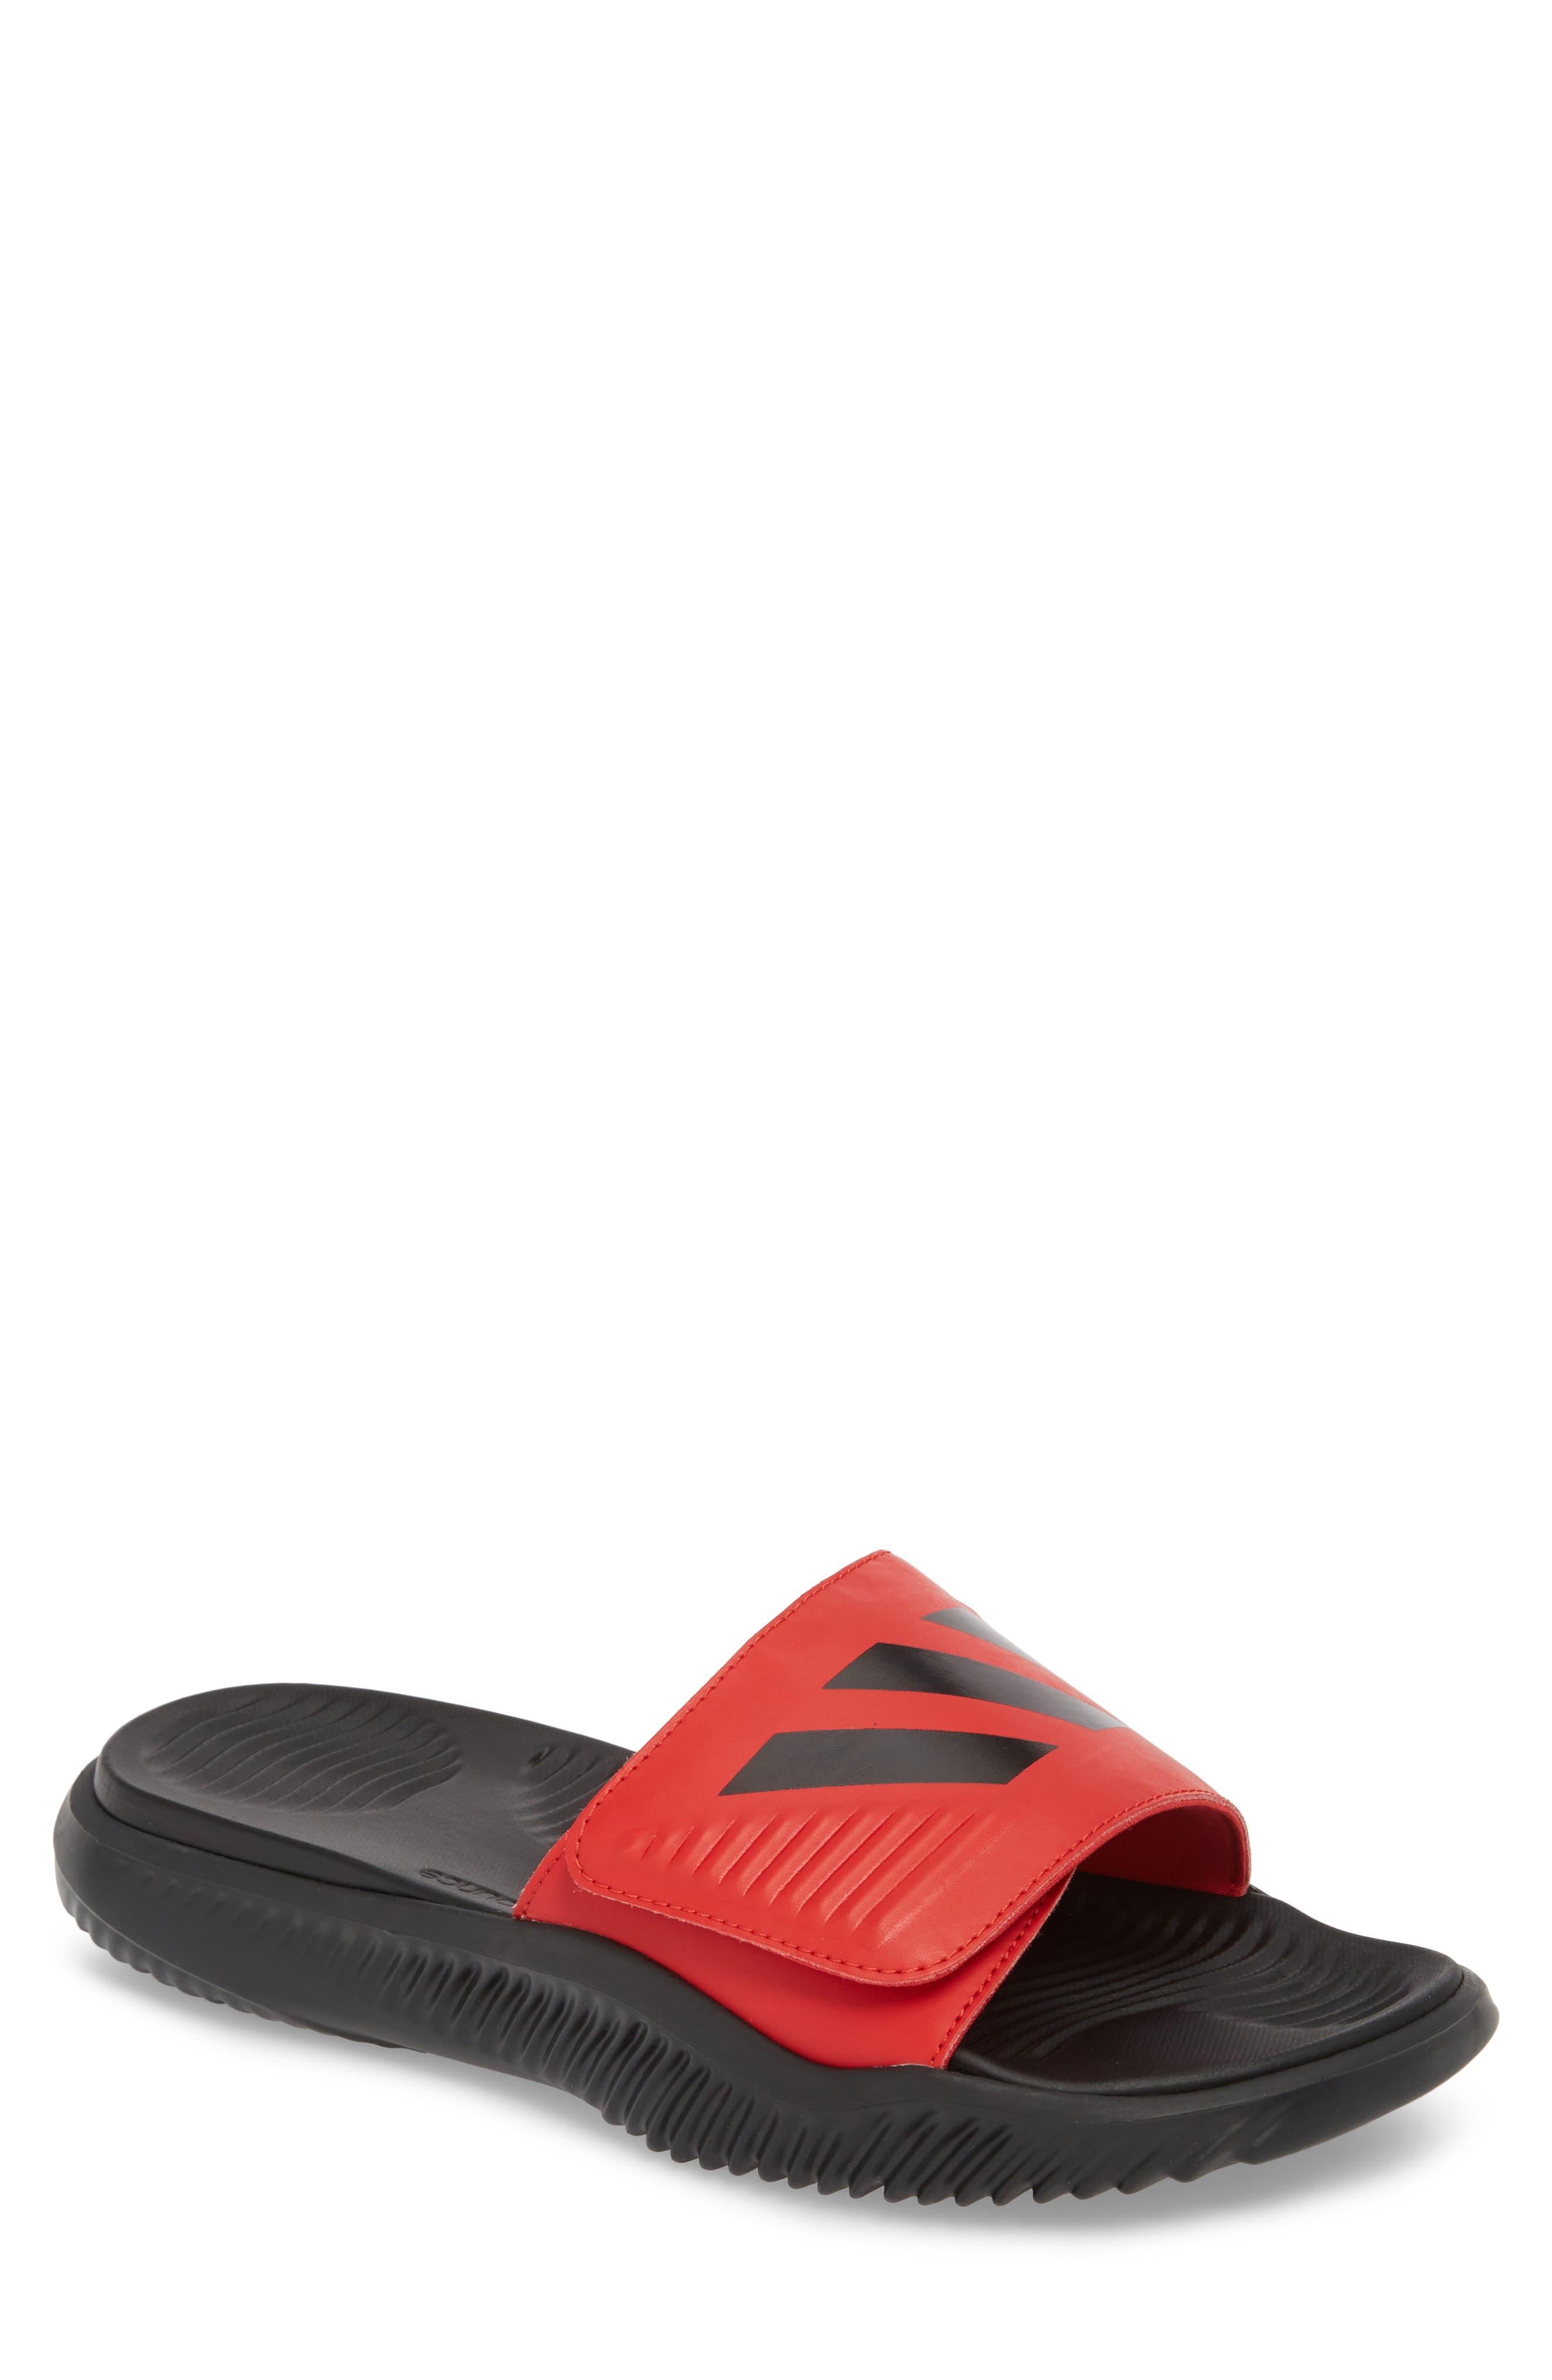 AlphaBounce Slide Sandal,                             Main thumbnail 1, color,                             SCARLET/ BLACK